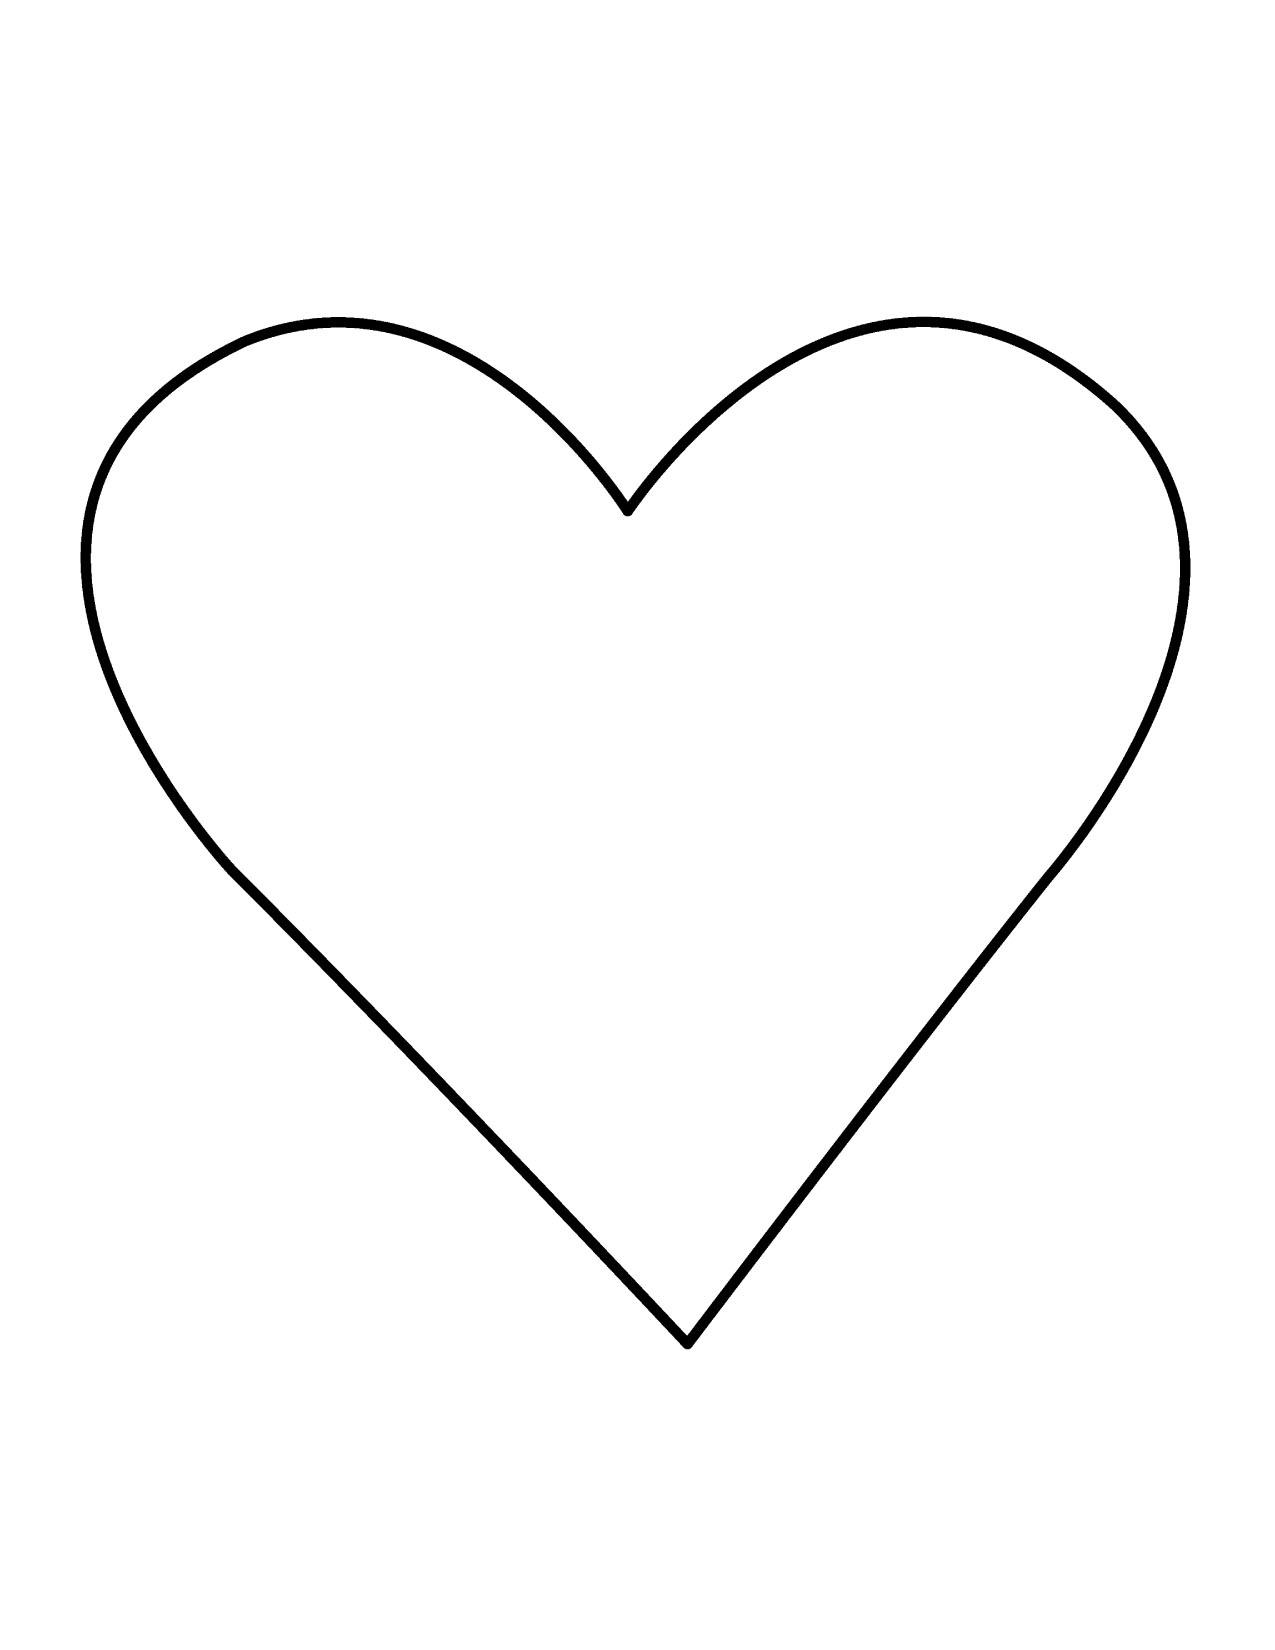 Clip Art Heart Outline - Heart Images Clipart